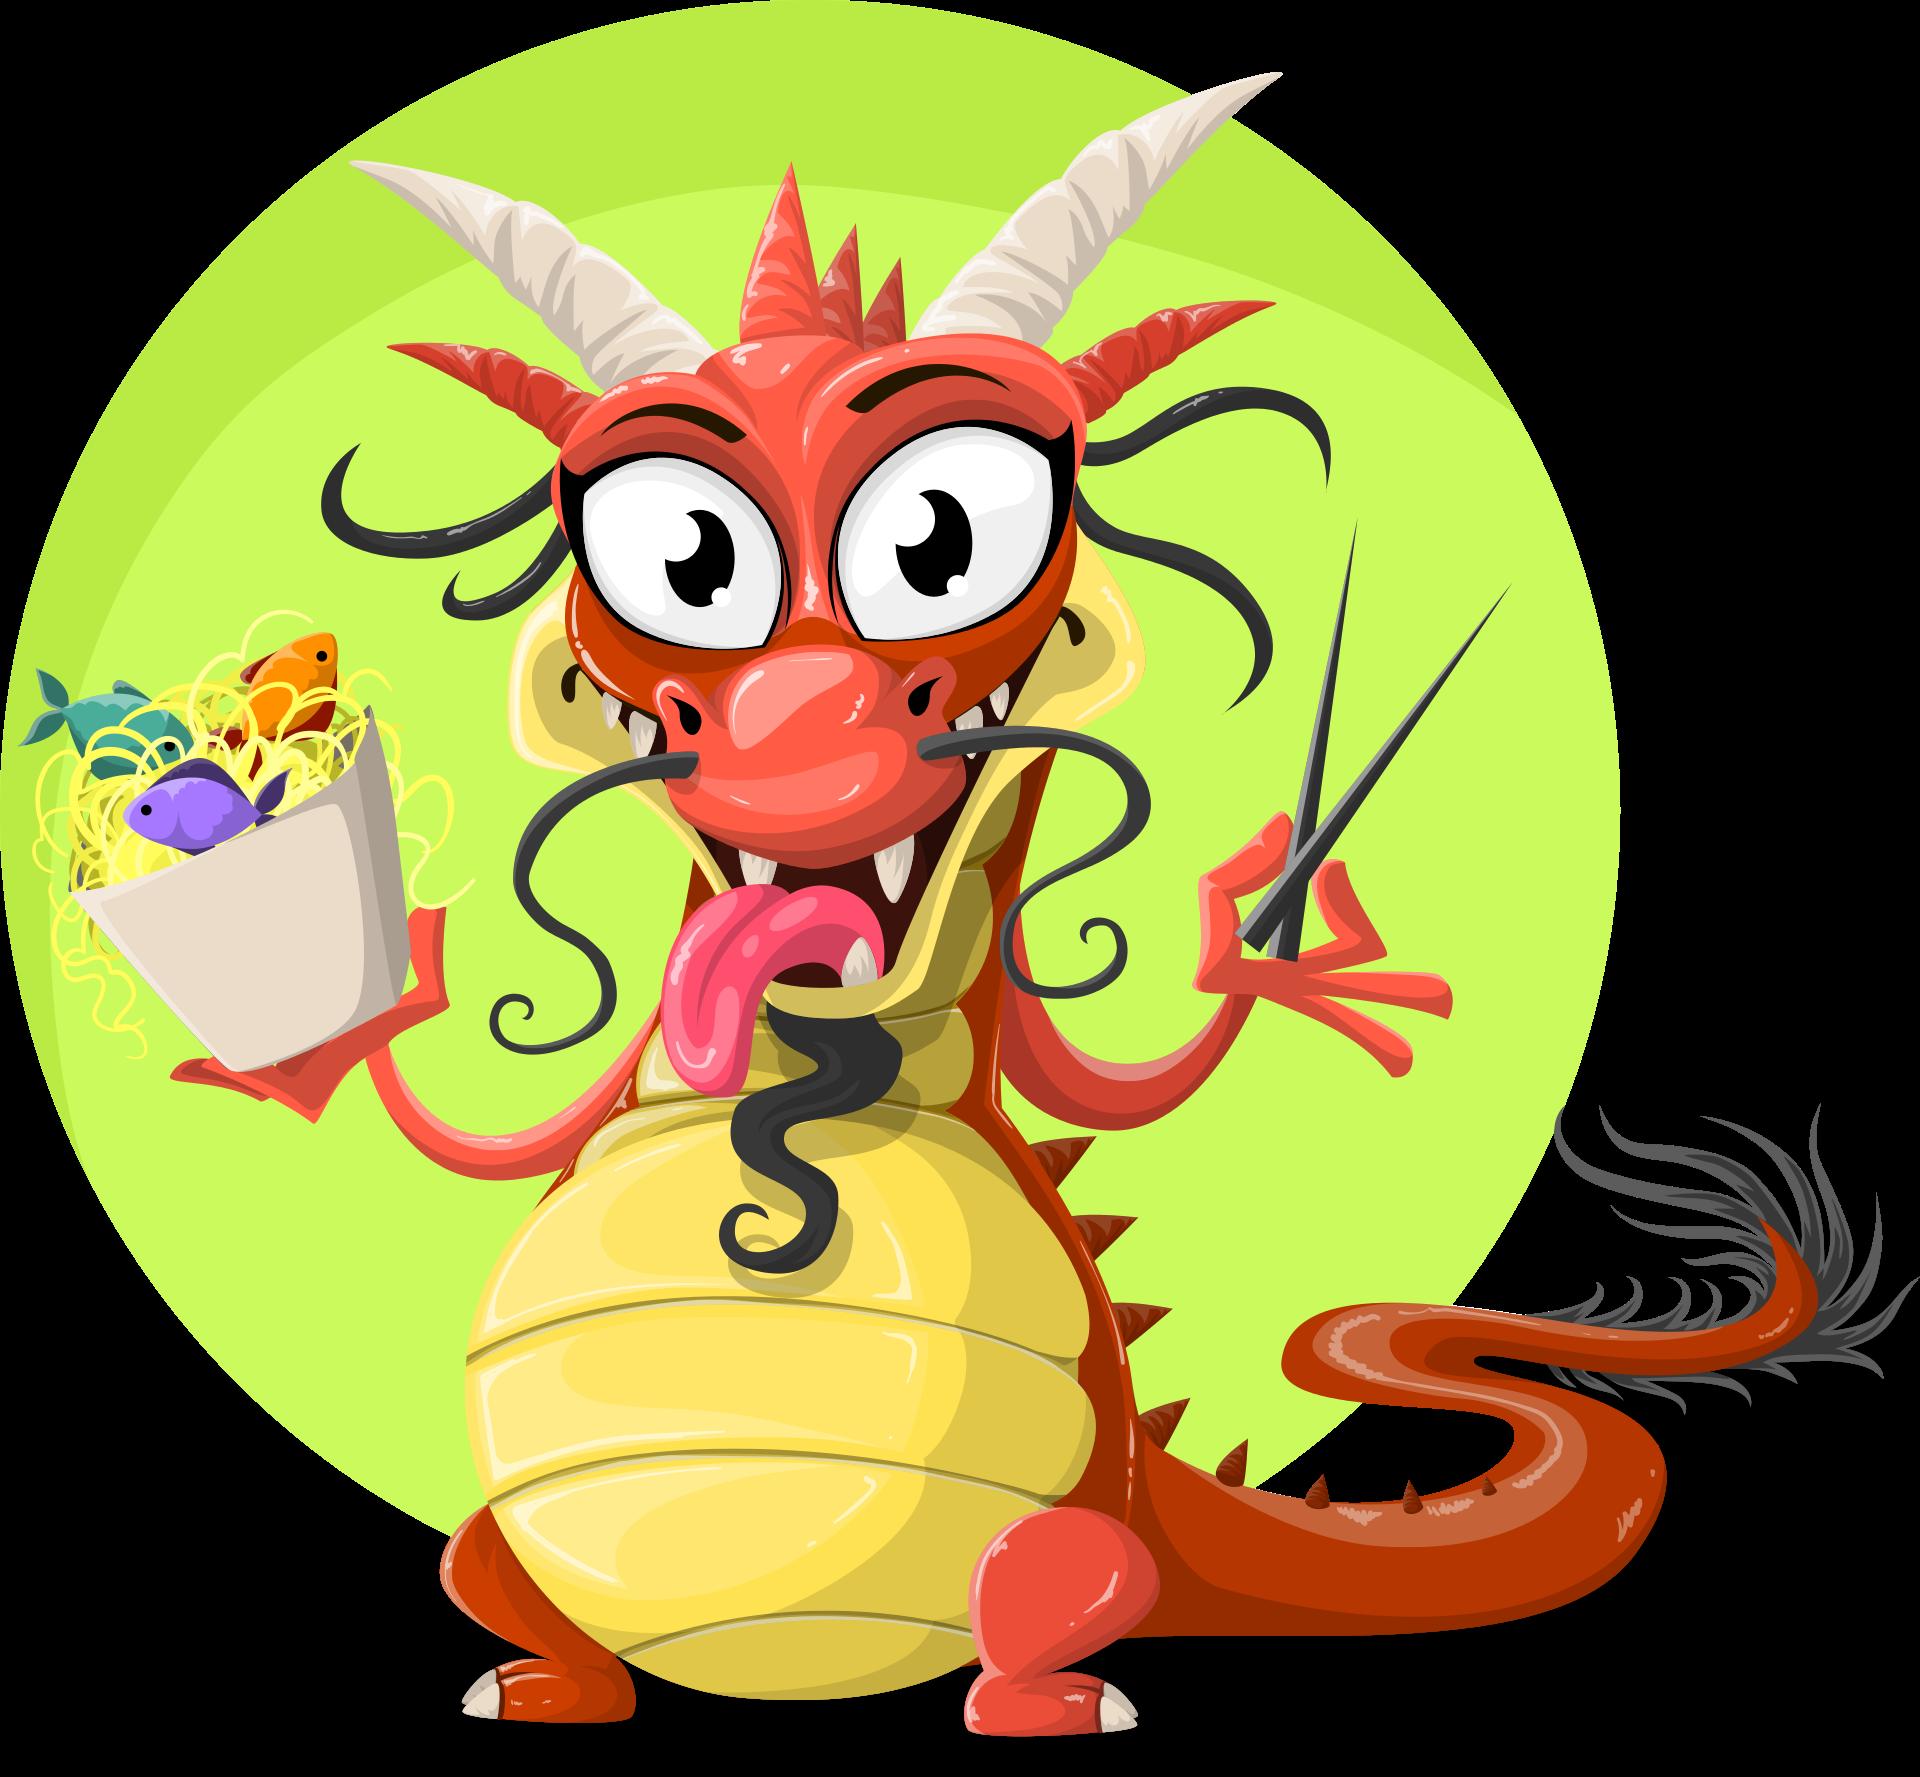 dragón, chino, comida, fideos, pescado - Fondos de Pantalla HD - professor-falken.com